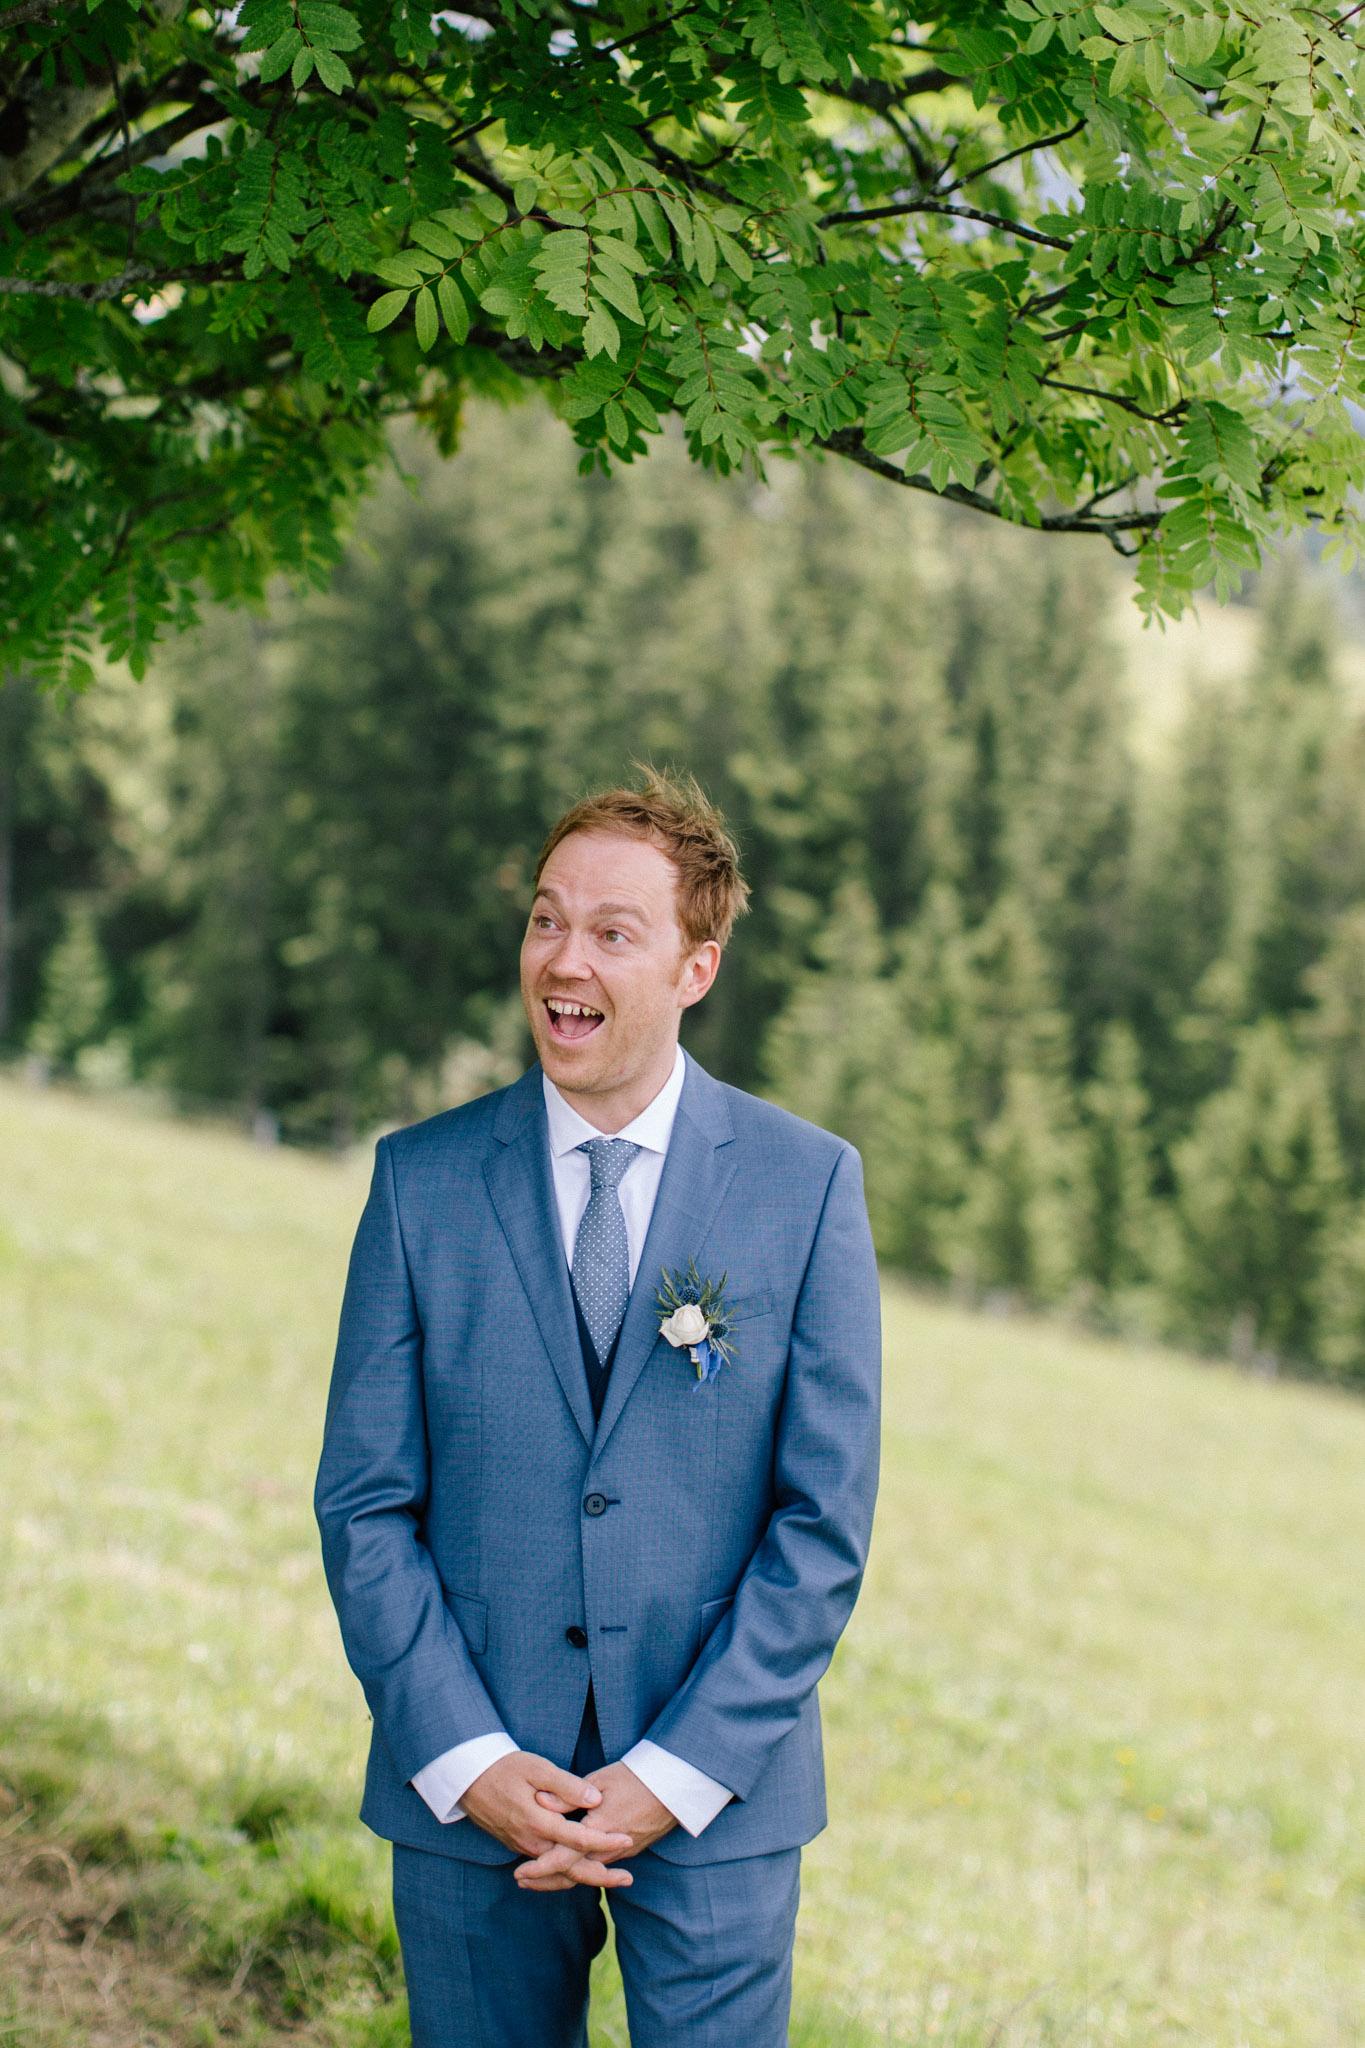 Lenl-Simmental-Buehlerhof-Pia-Anna-Christian-Wedding-Photography-EK-32.jpg